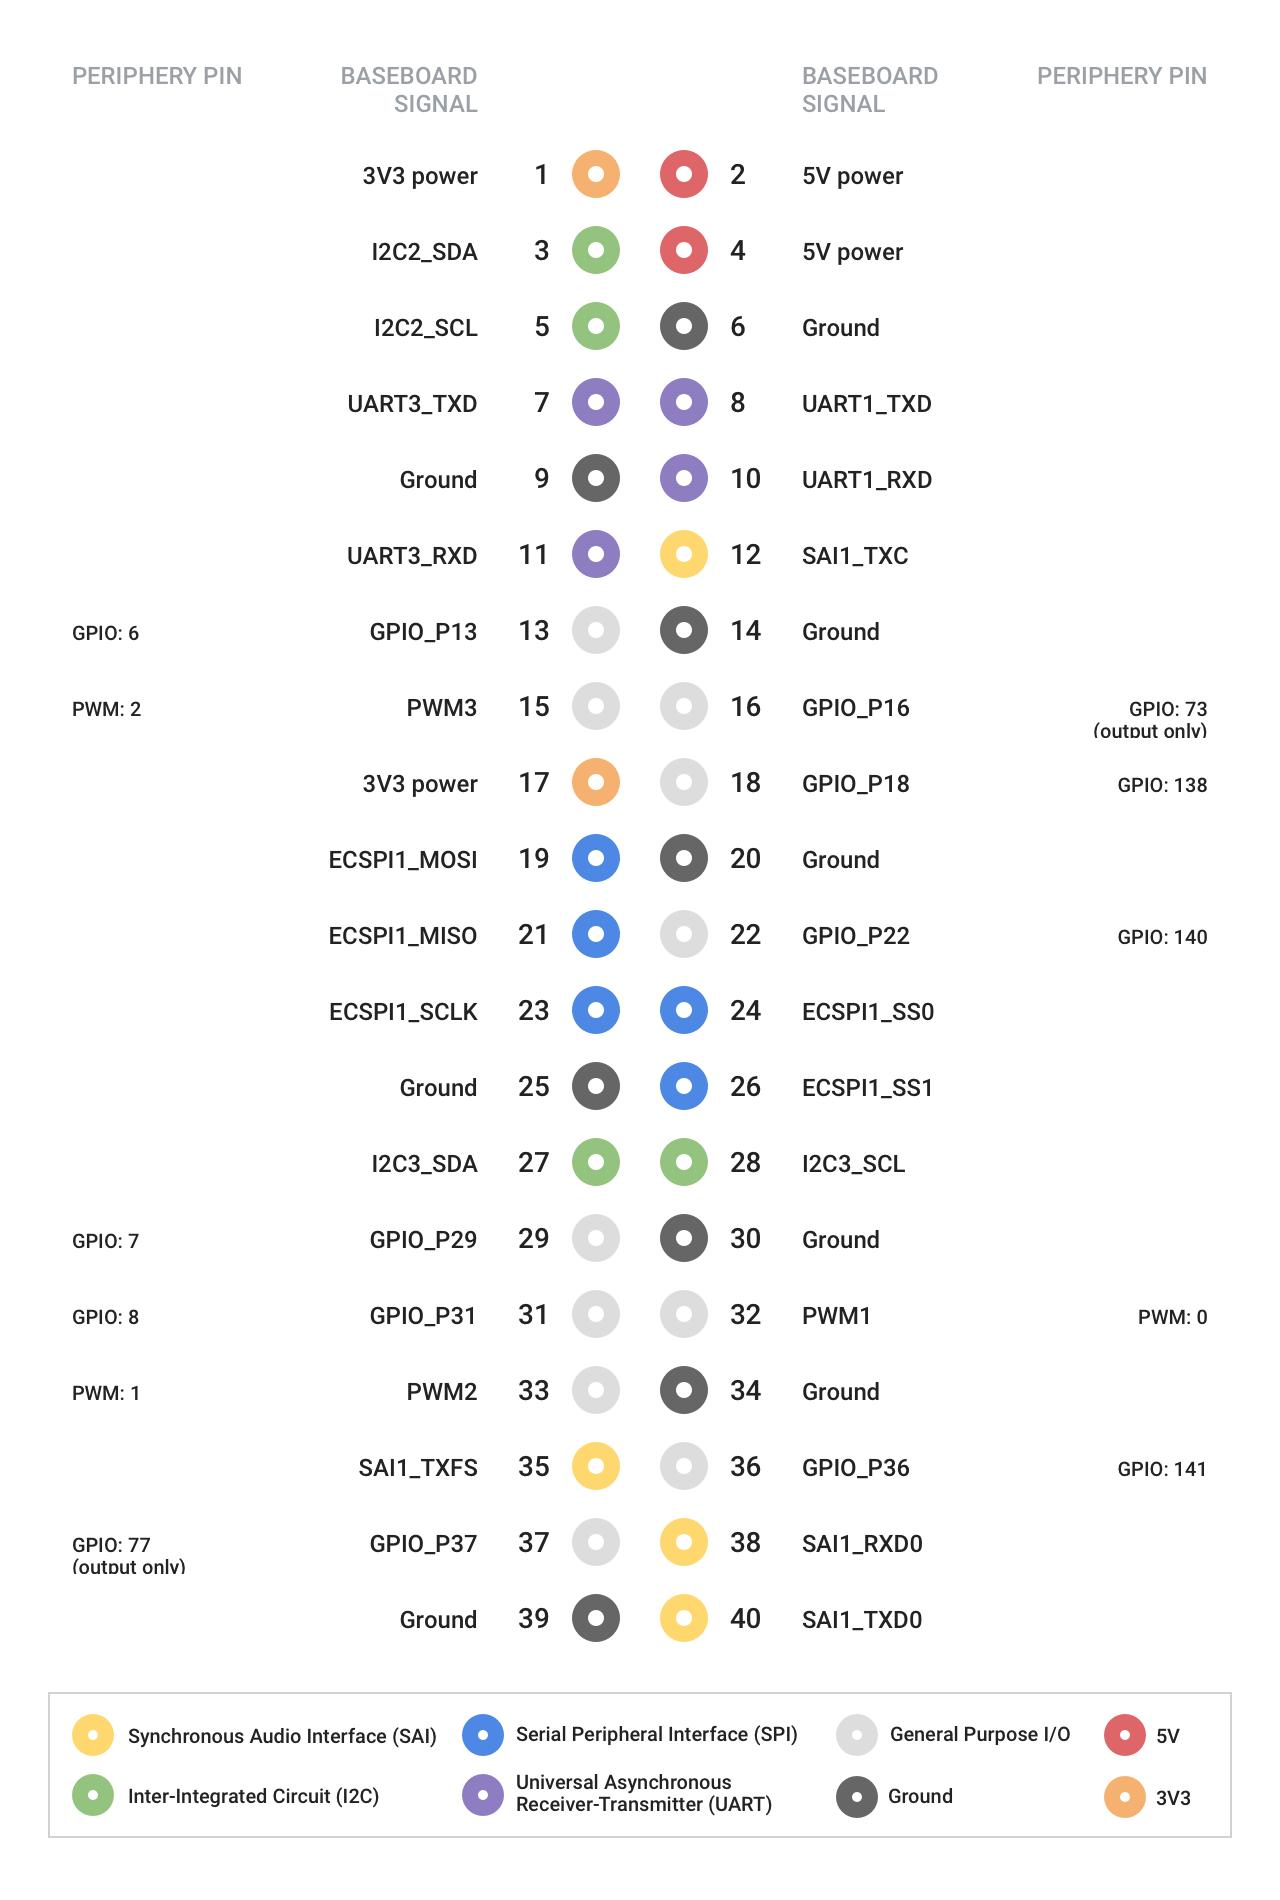 circuitpython_devboard-pinout-periphery.png